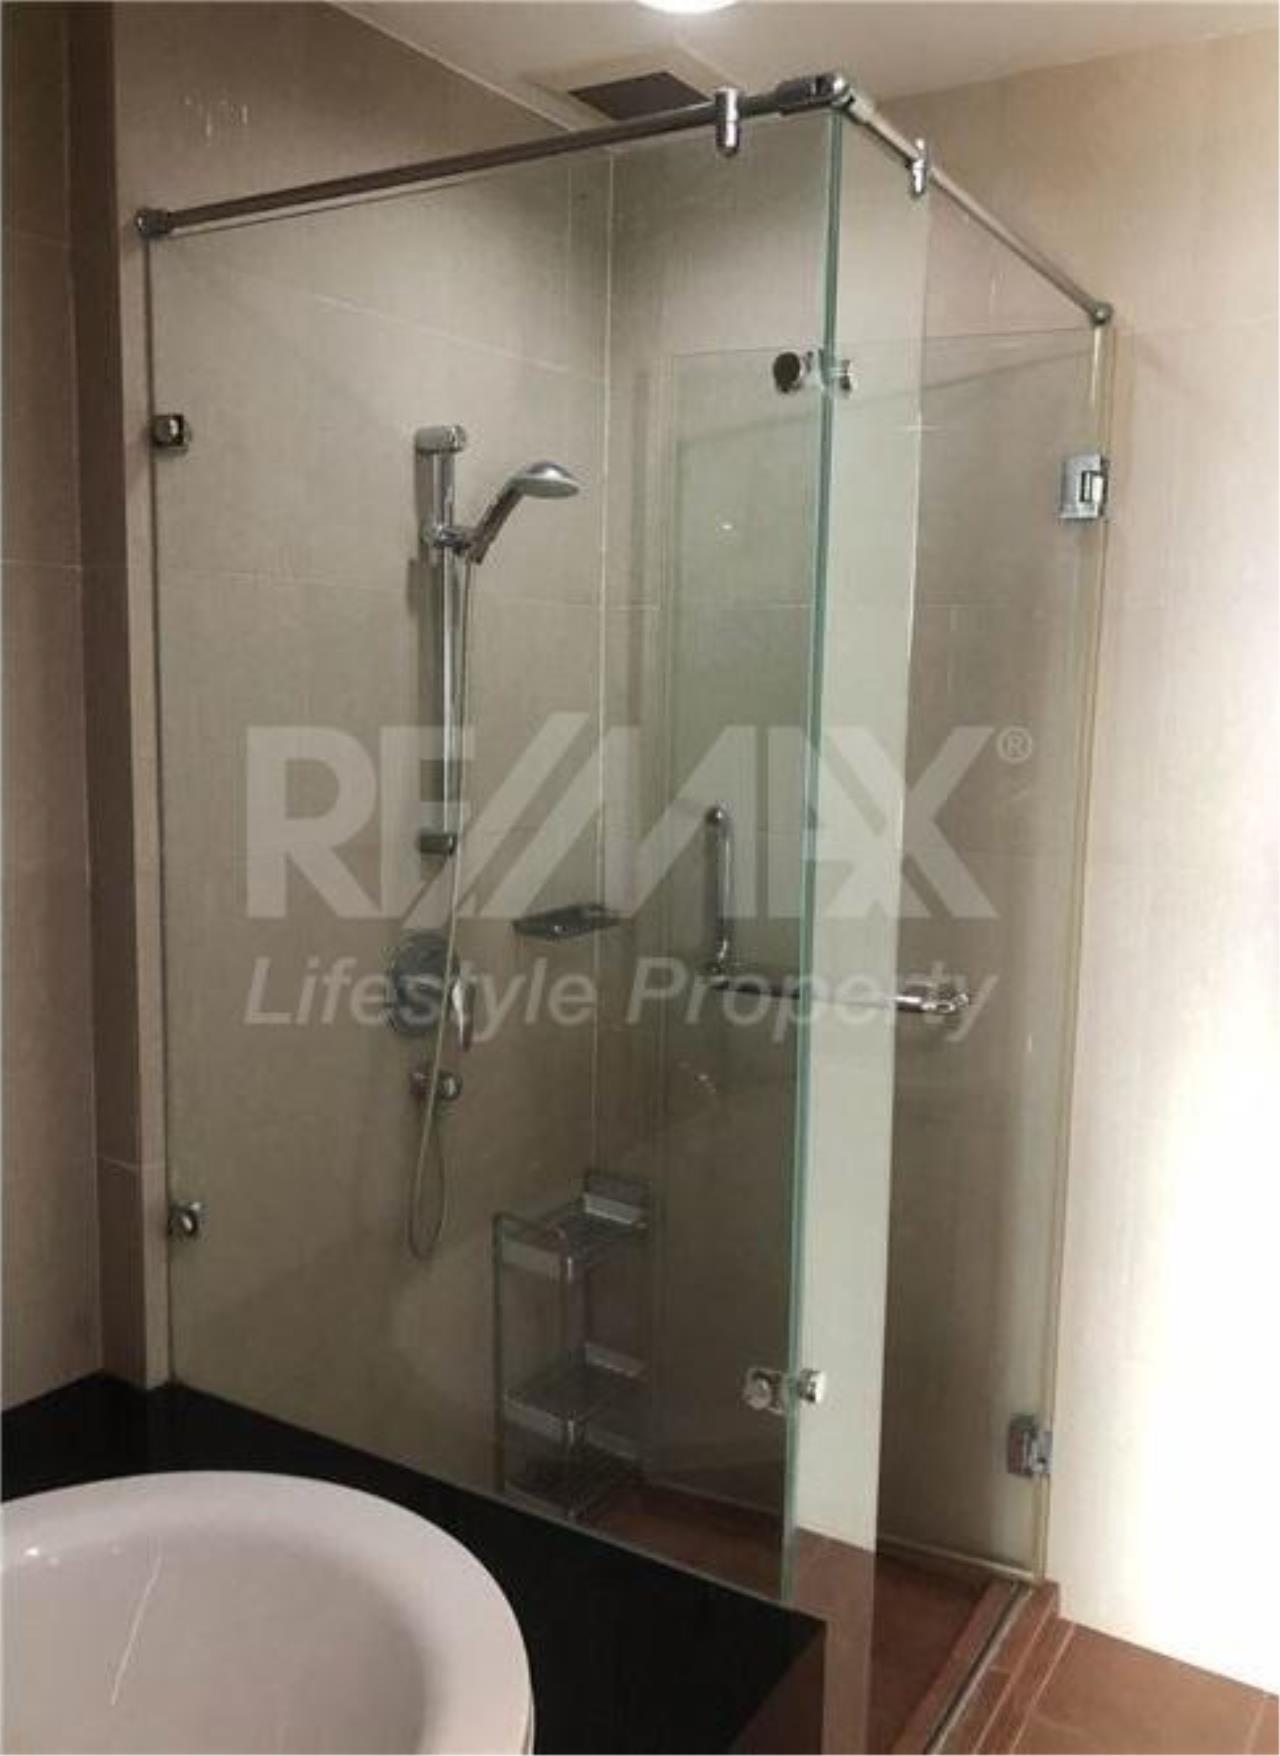 RE/MAX LifeStyle Property Agency's Baan Rajprasong 13